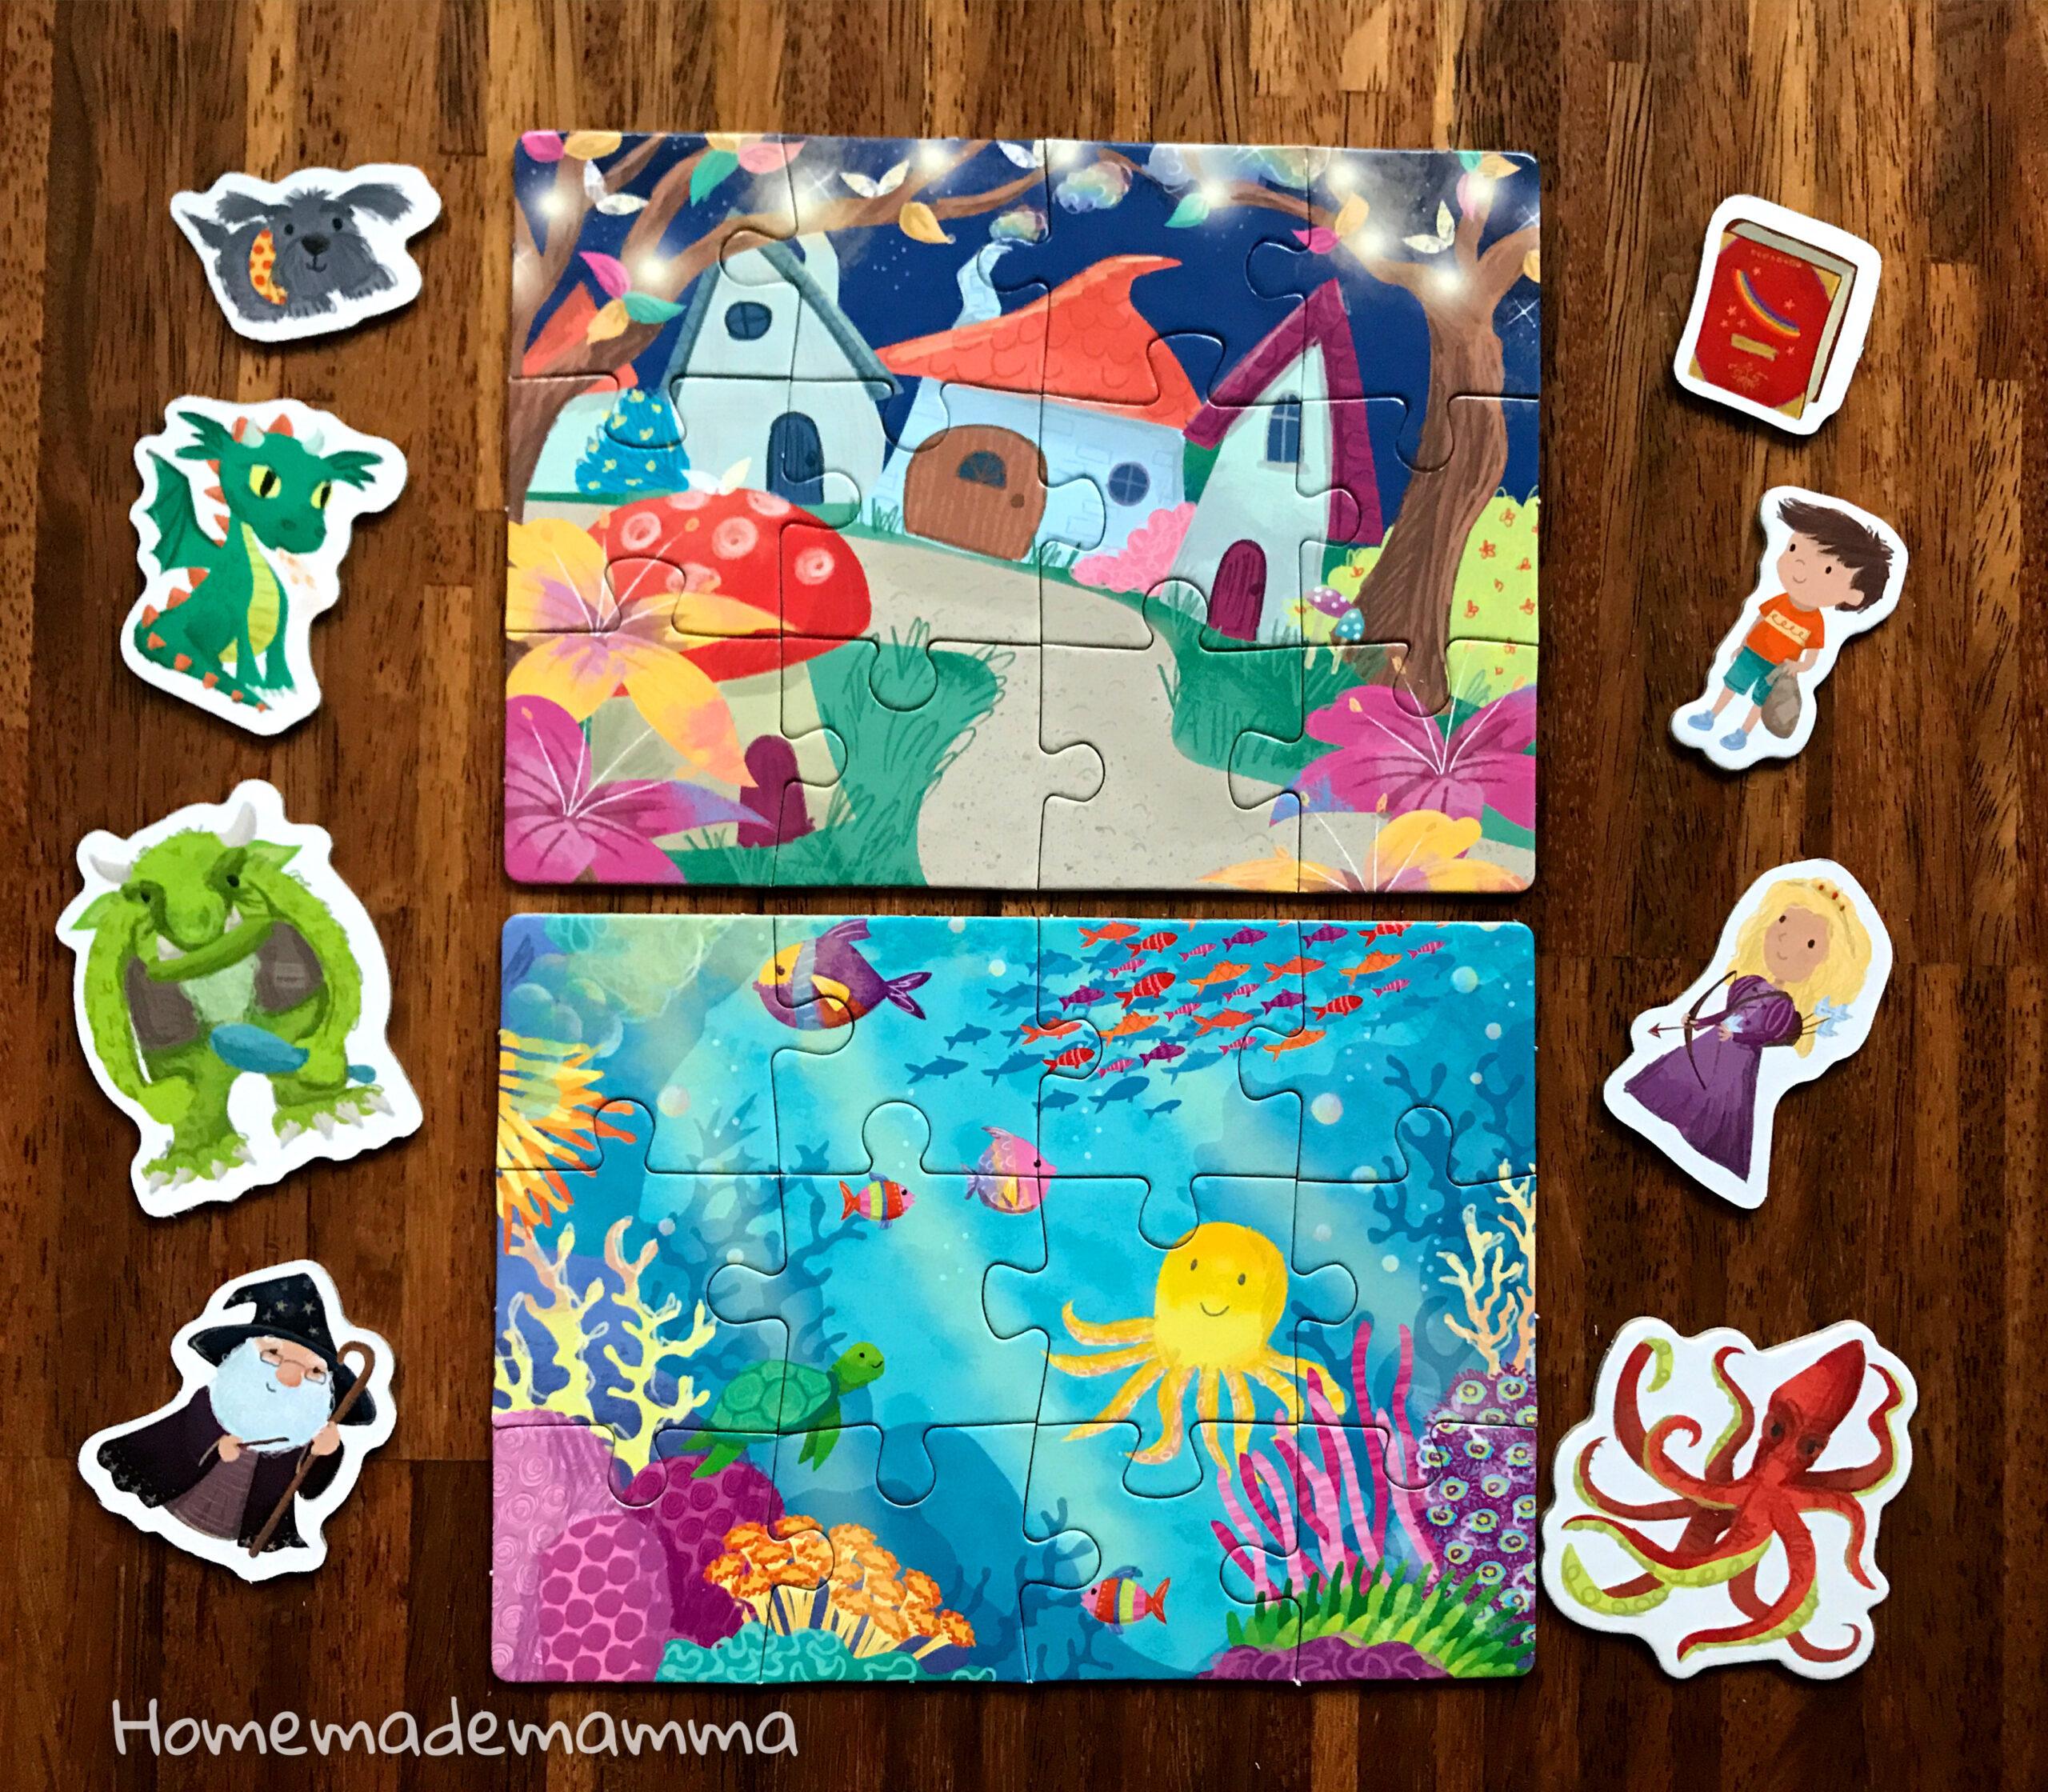 Inventastorie headu gioco per bimbi inventare storie piccoli creatività